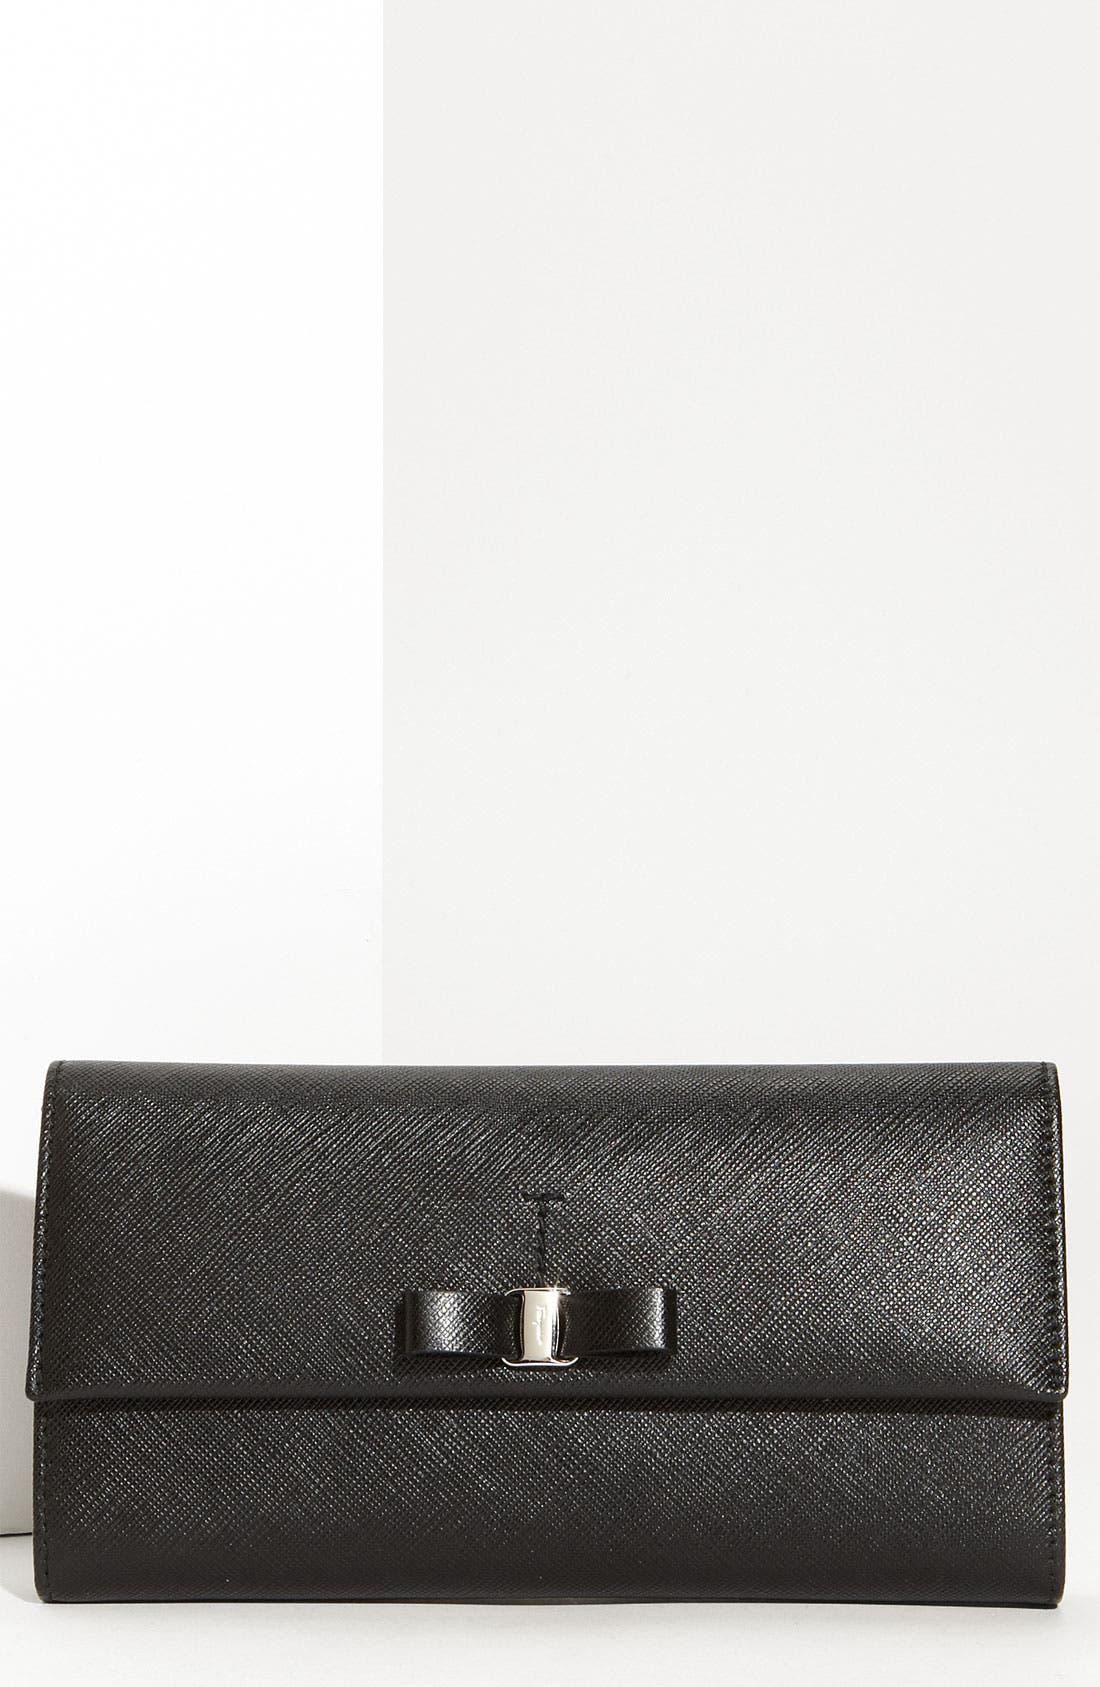 Main Image - Salvatore Ferragamo 'Vara' Continental Wallet